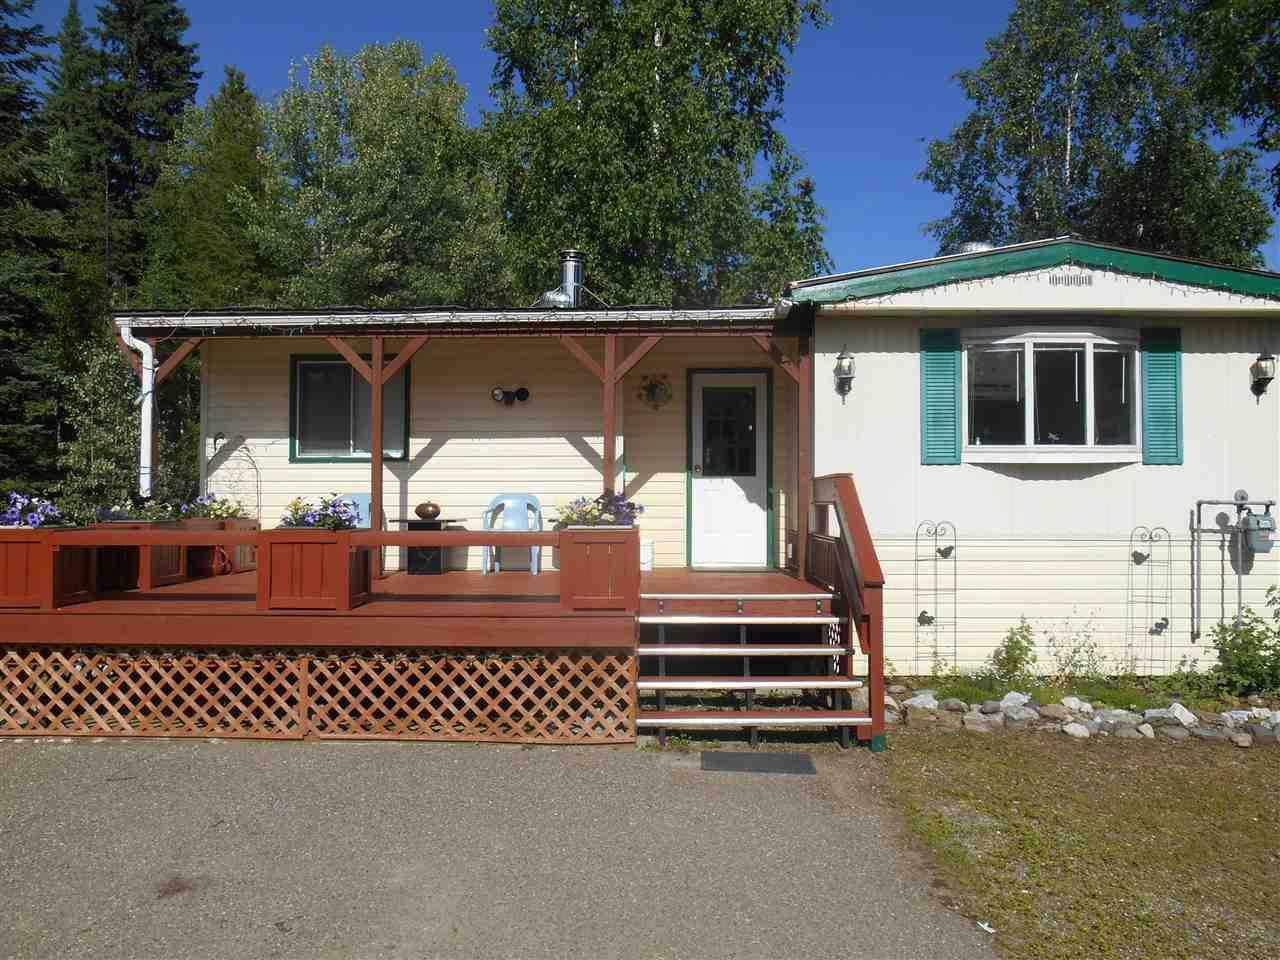 Main Photo: 8790 MCPHEE Road in Prince George: Reid Lake Manufactured Home for sale (PG Rural North (Zone 76))  : MLS®# R2188015